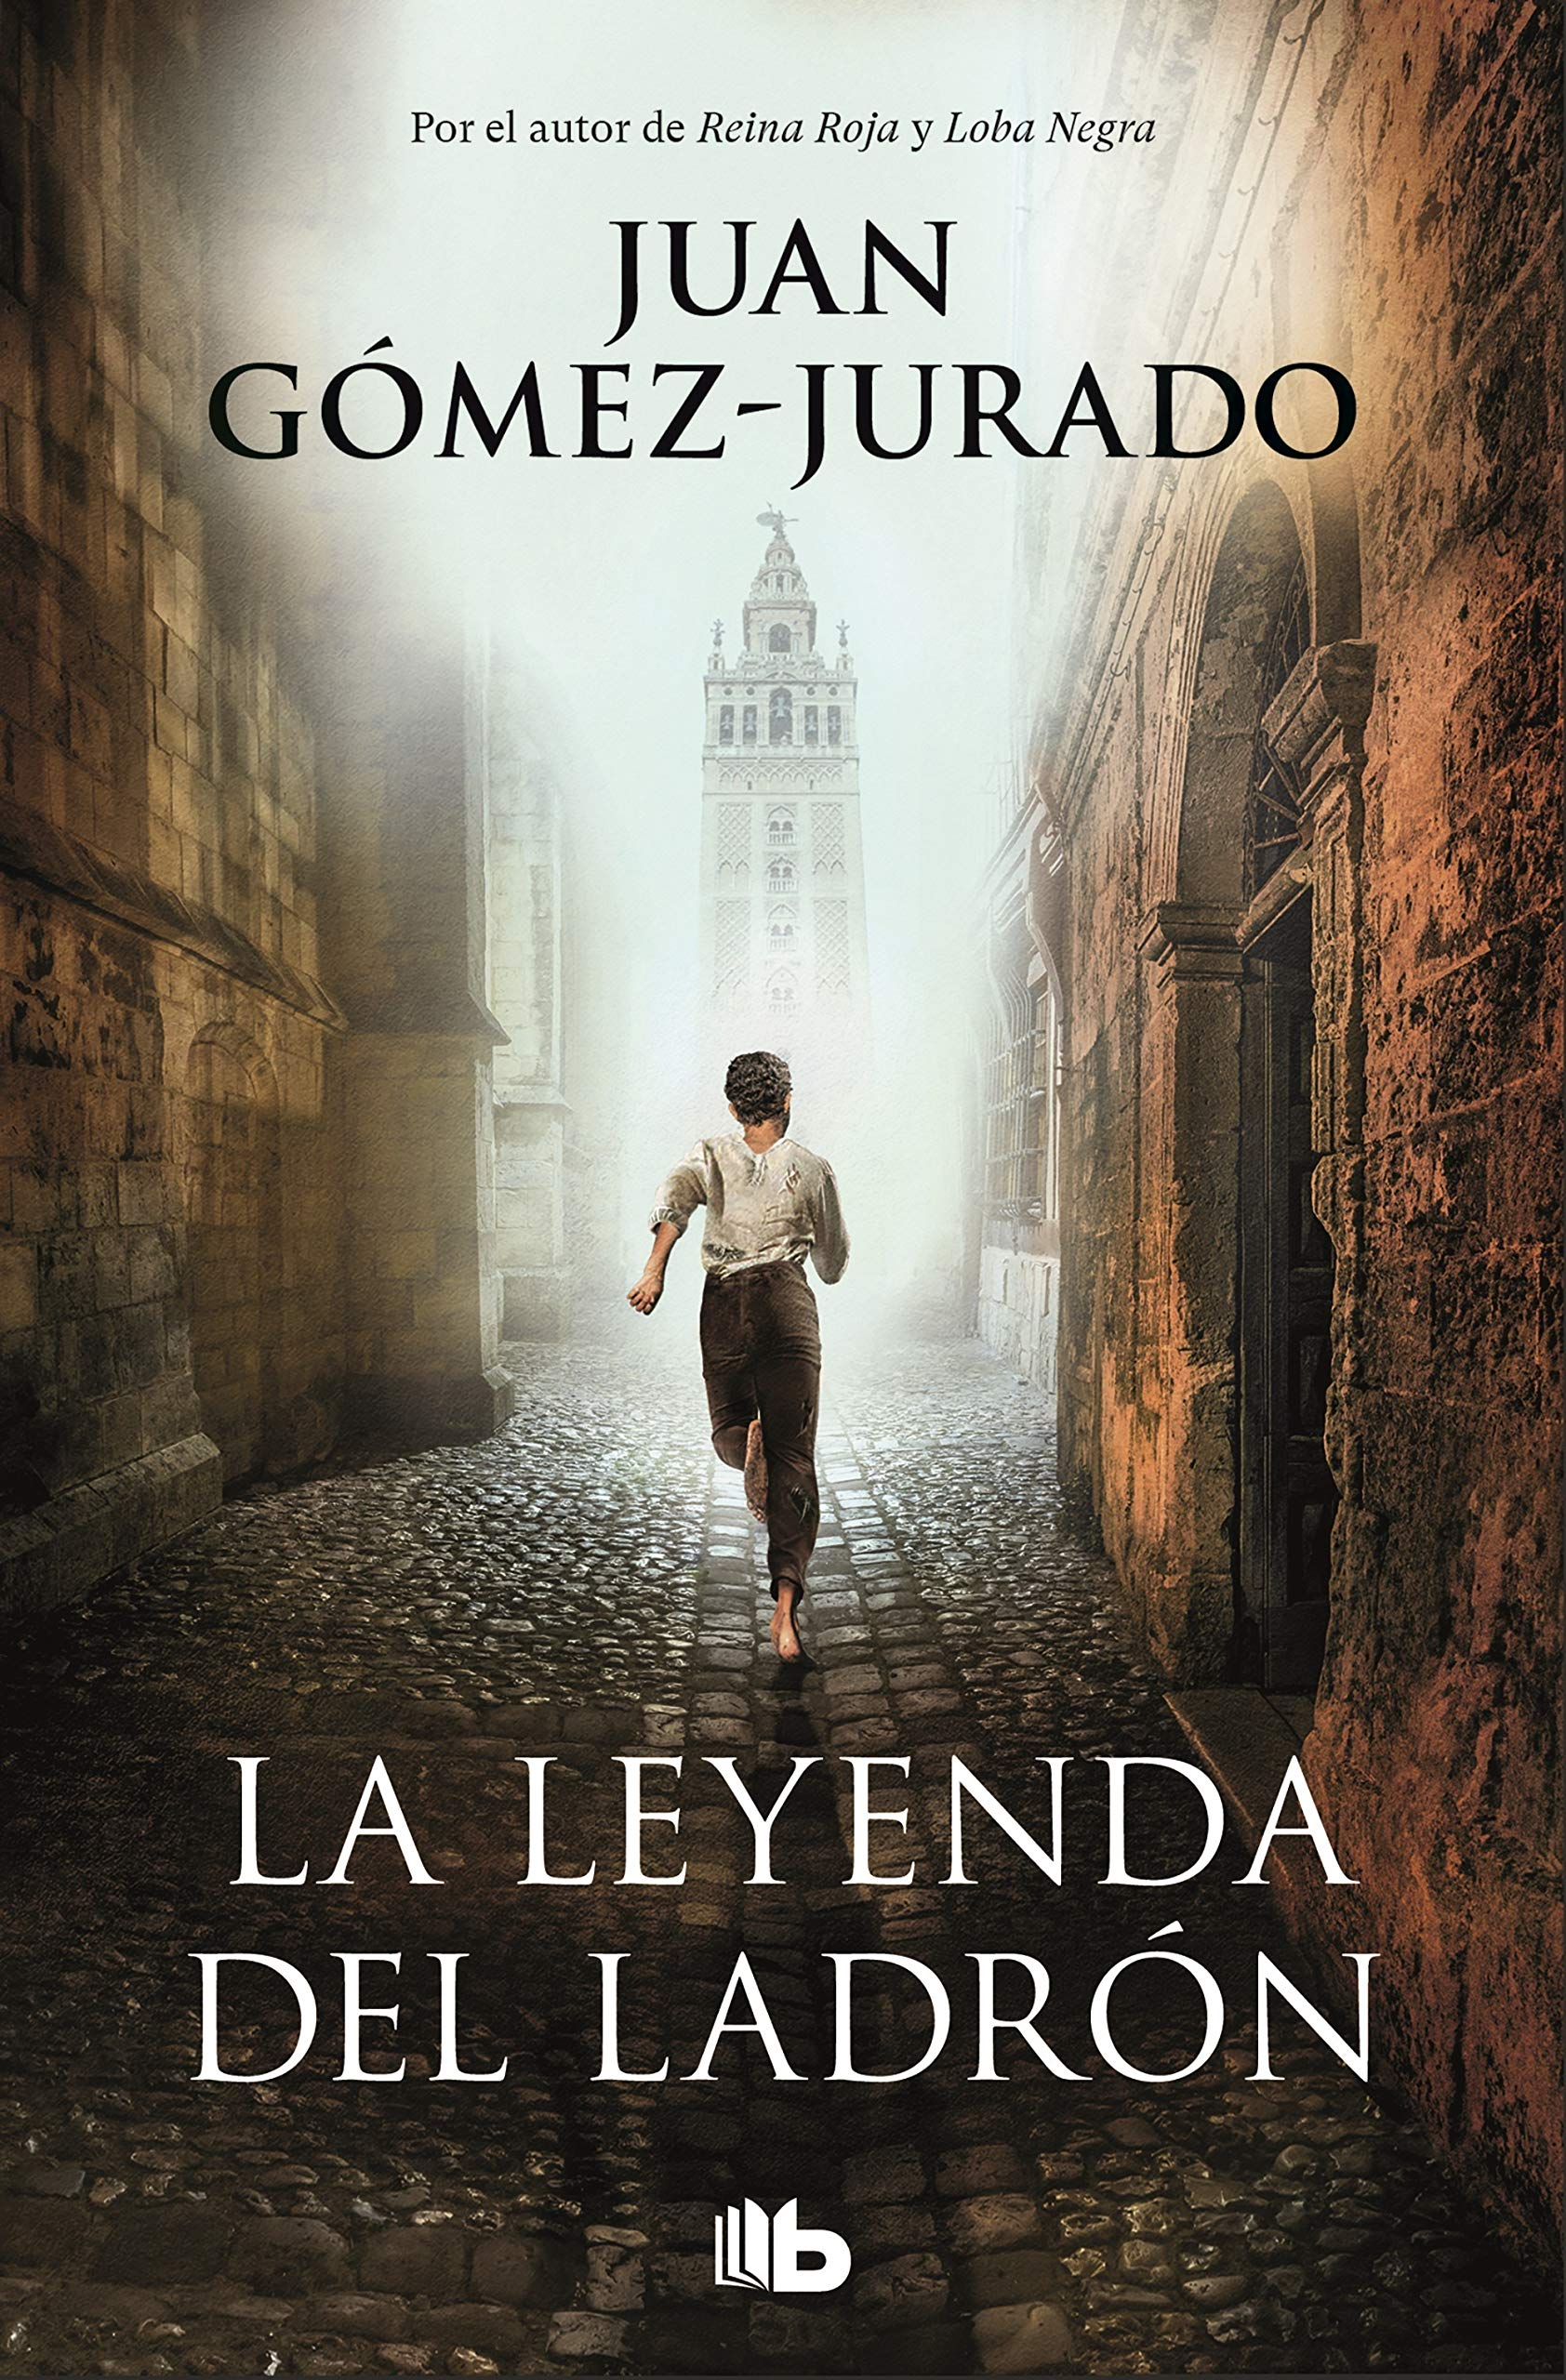 La leyenda del ladrón por Juan Gómez-Jurado